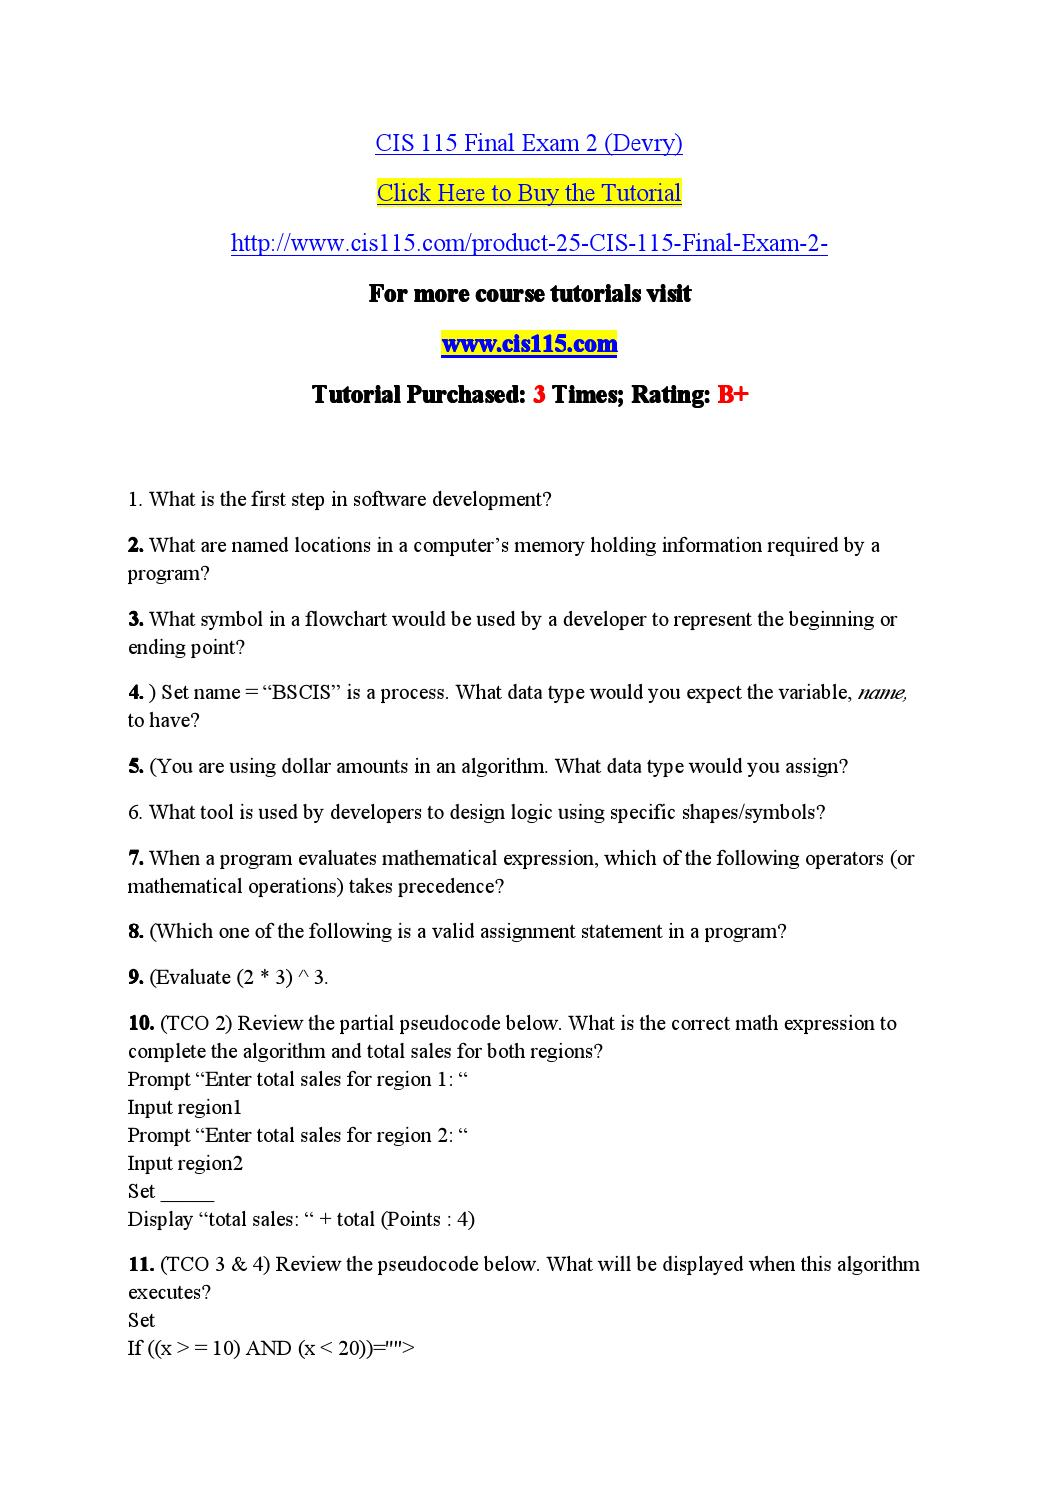 family pet essay contest